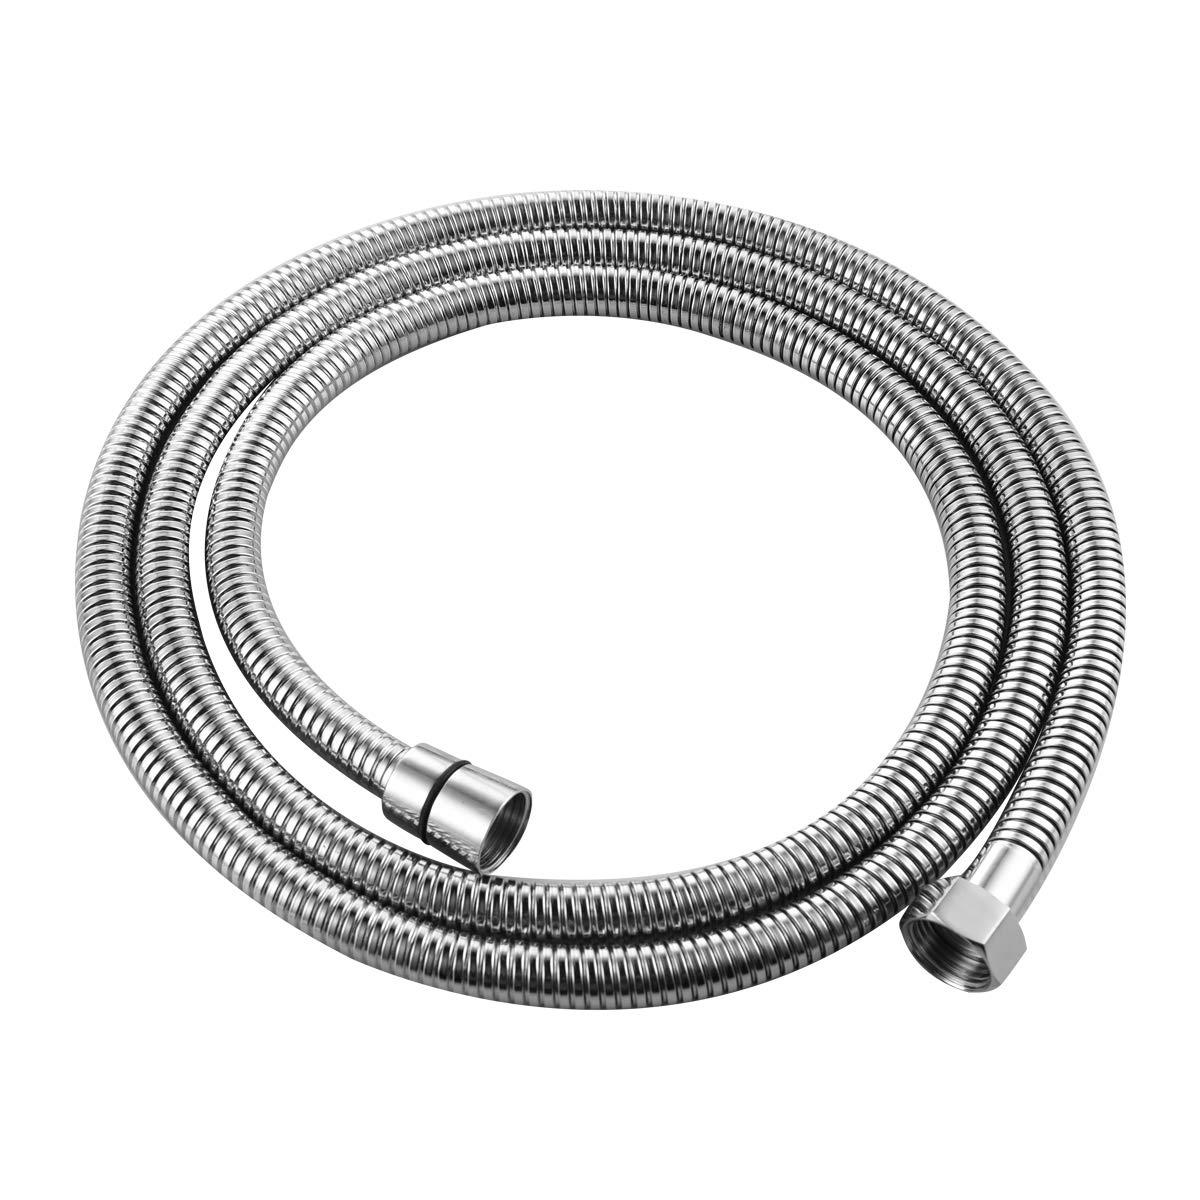 98 pulgadas Manguera de ducha flexible anti-torcedura Cromo pulido de acero inoxidable FHA020 CIENCIA 2.5 m